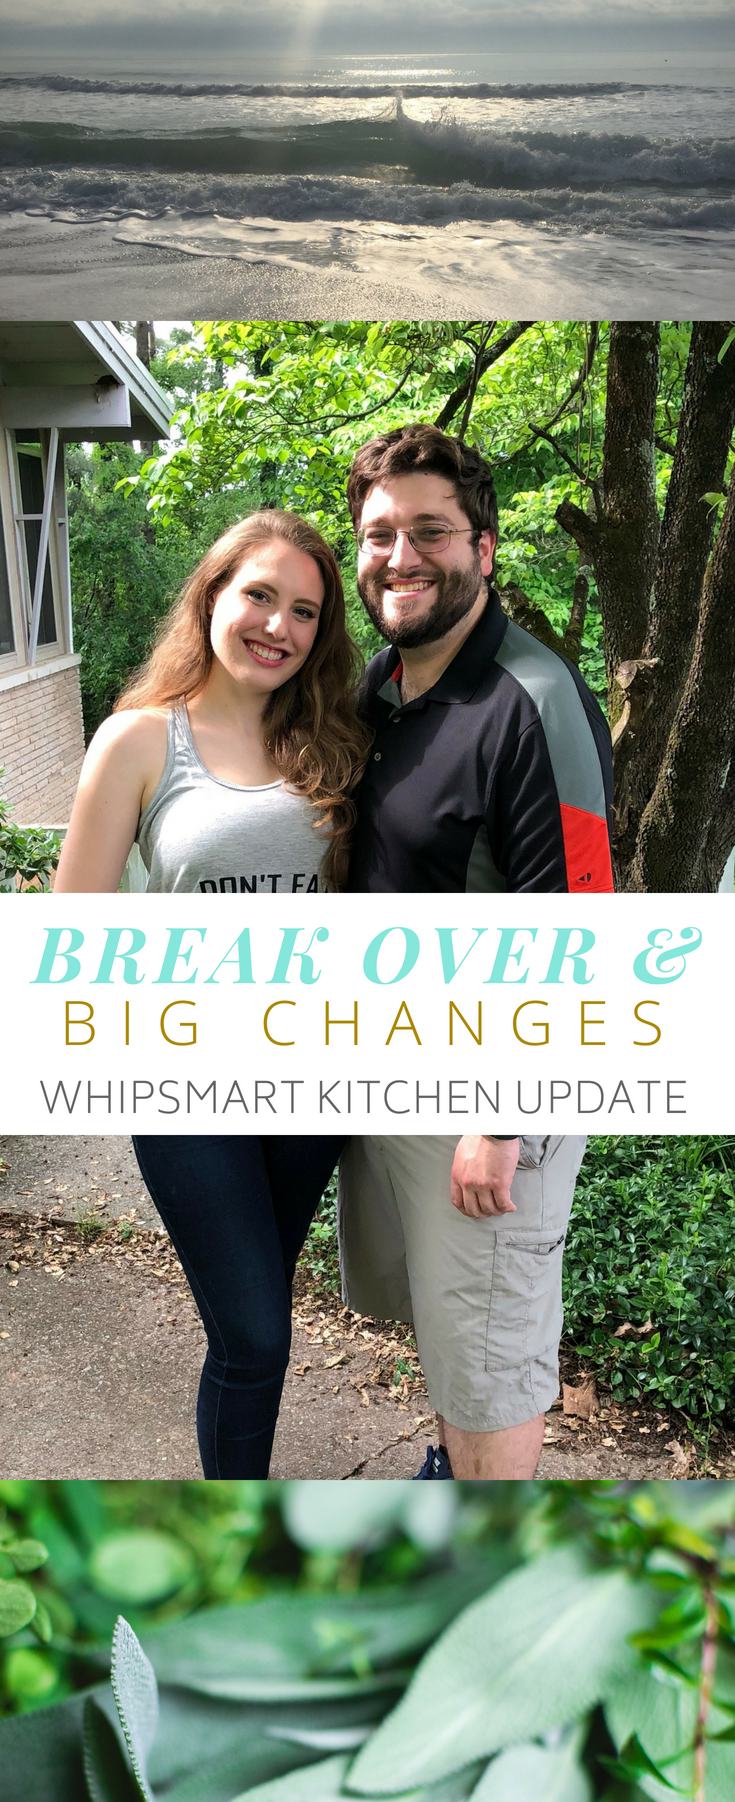 break-over-big-changes-pinterest.png